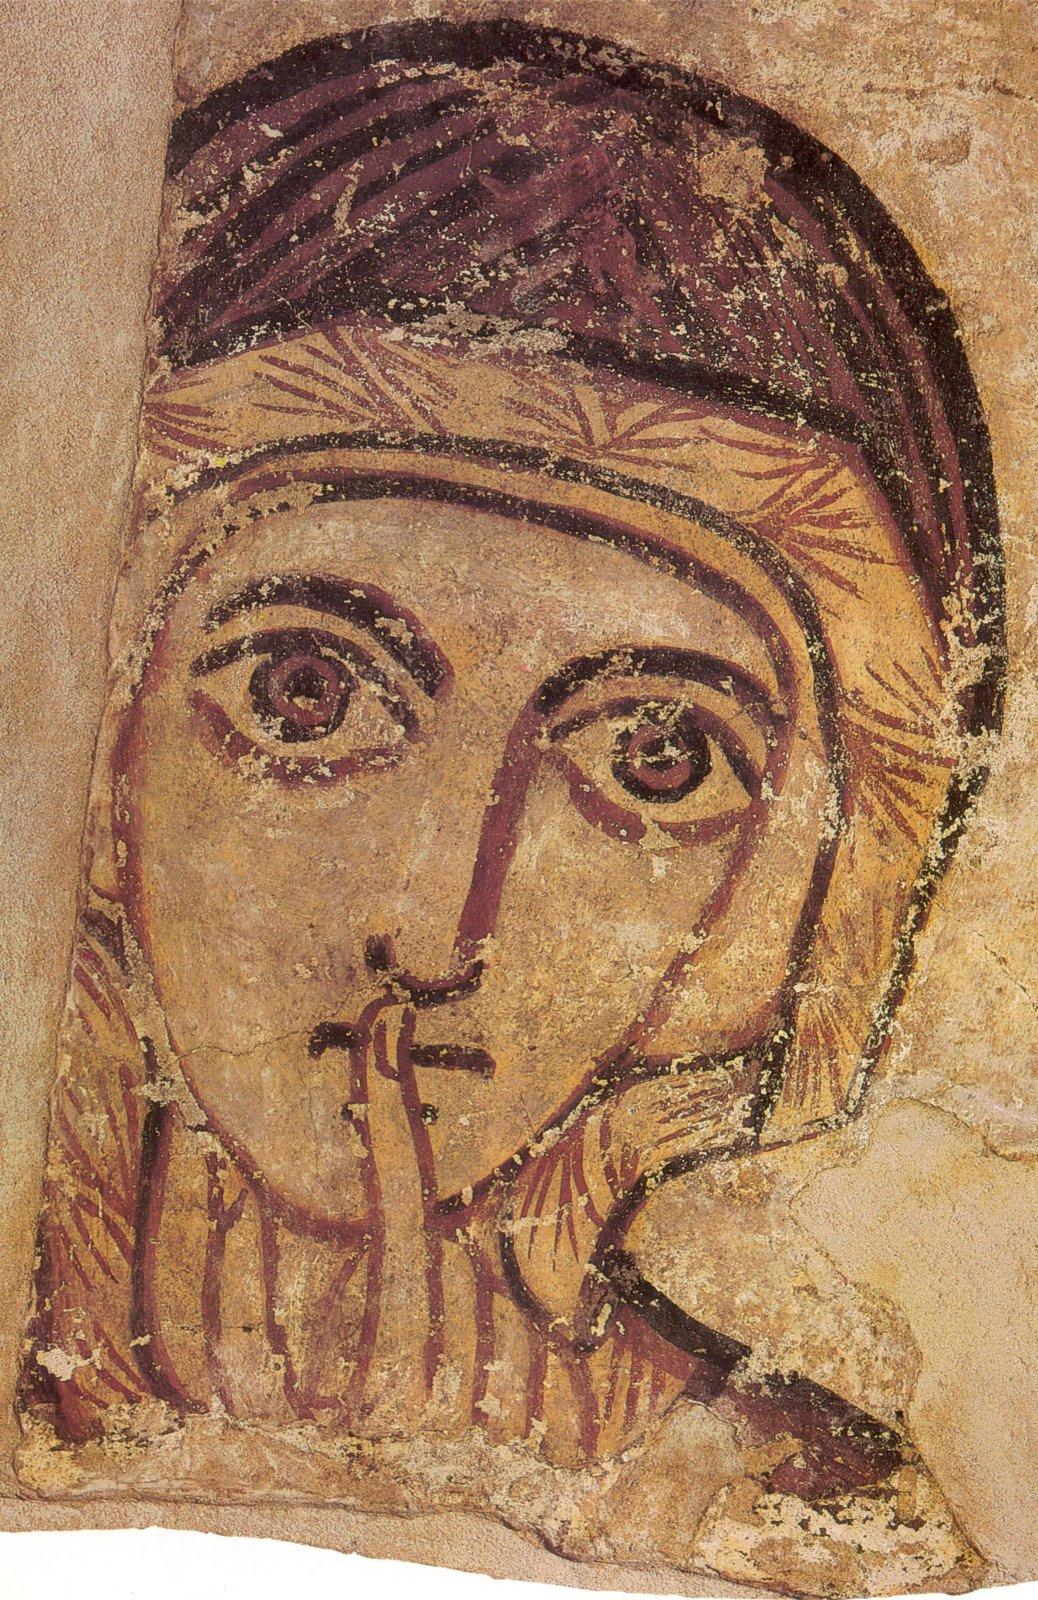 Silence, Presence, Lebh Shomea, Rumi